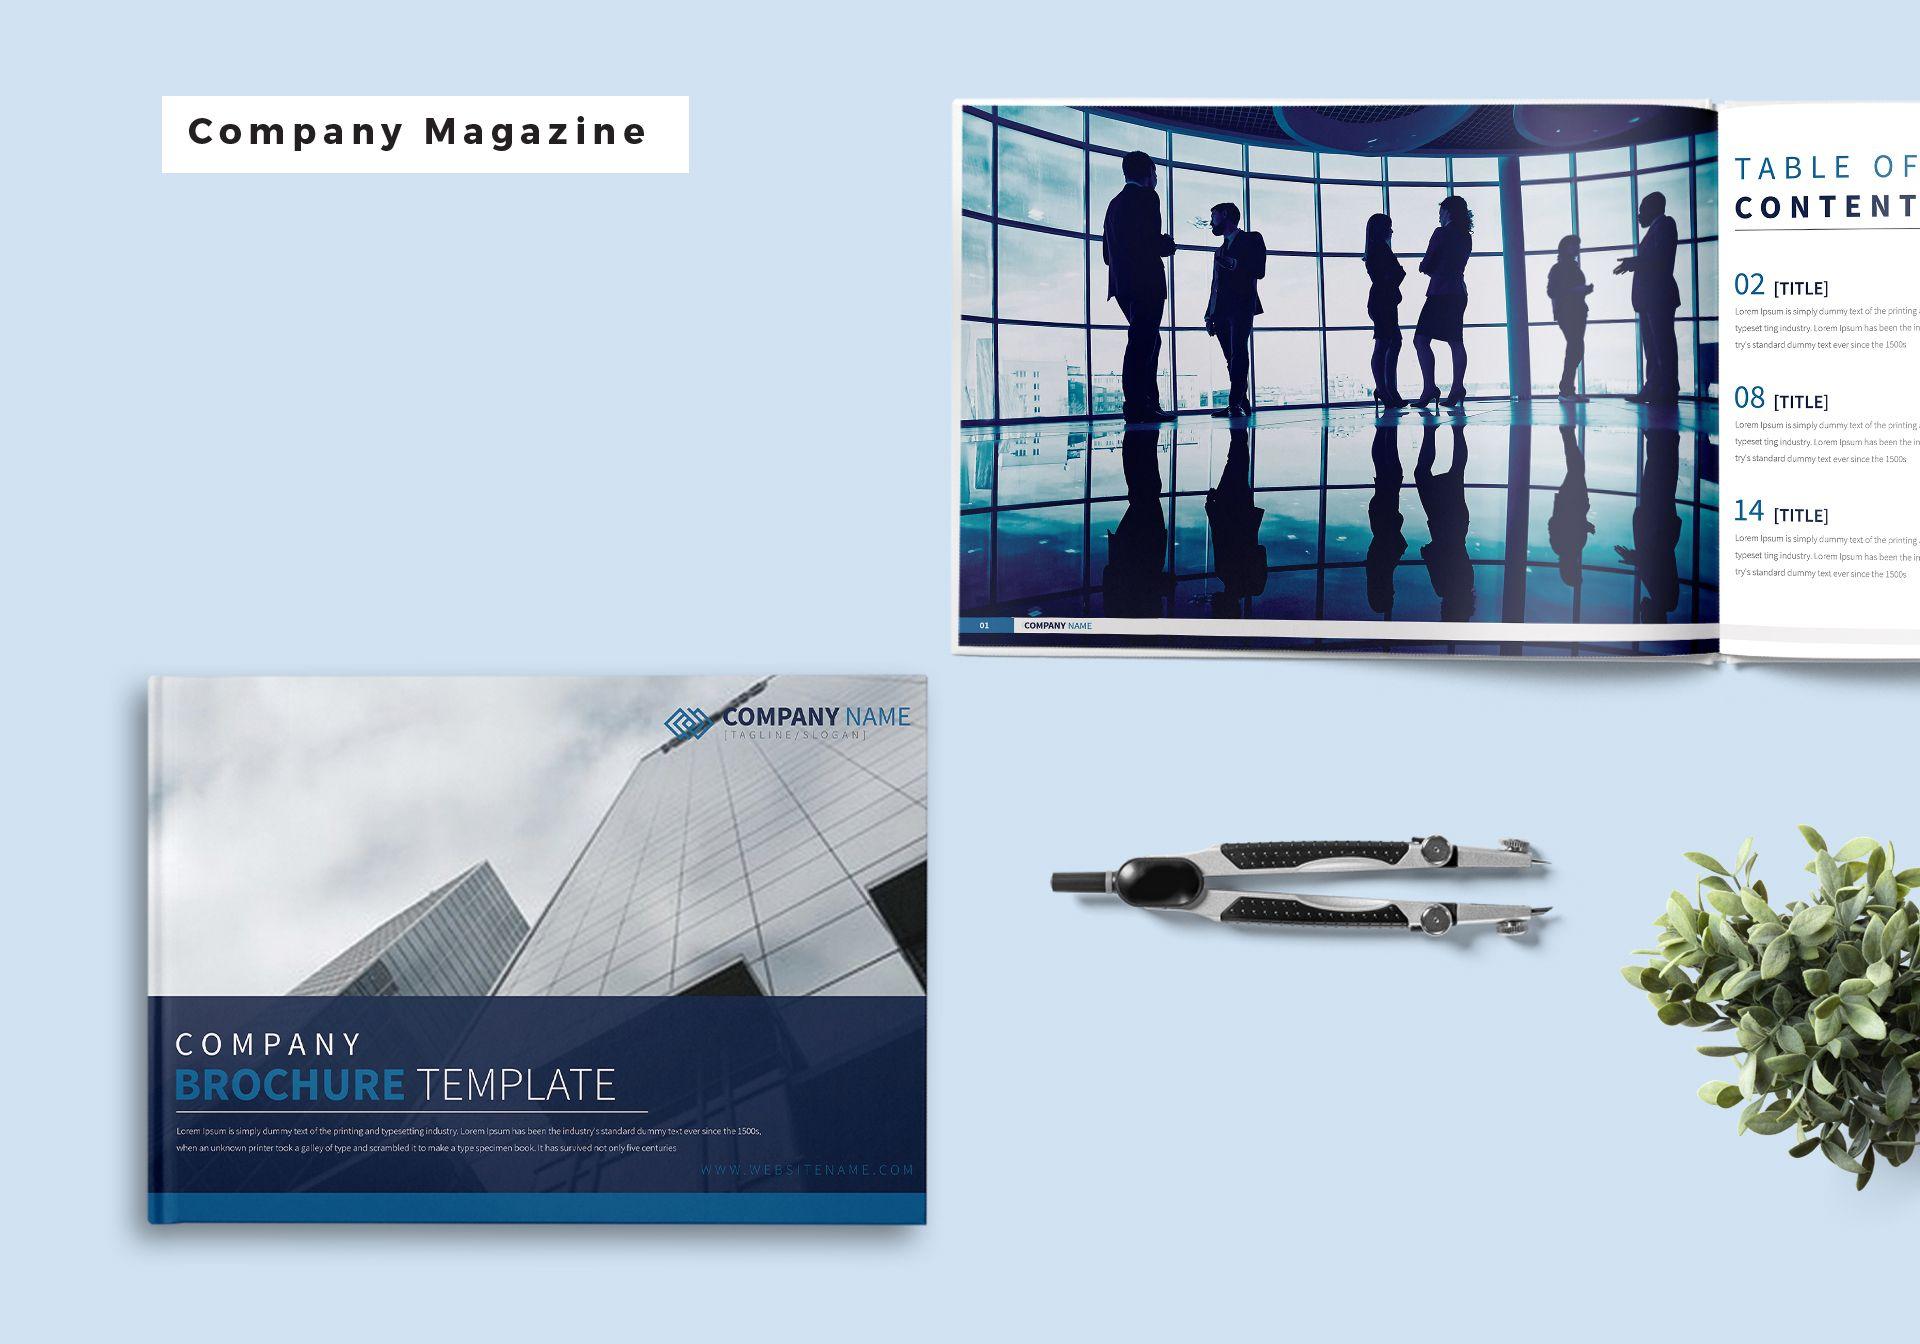 Company Magazine Template